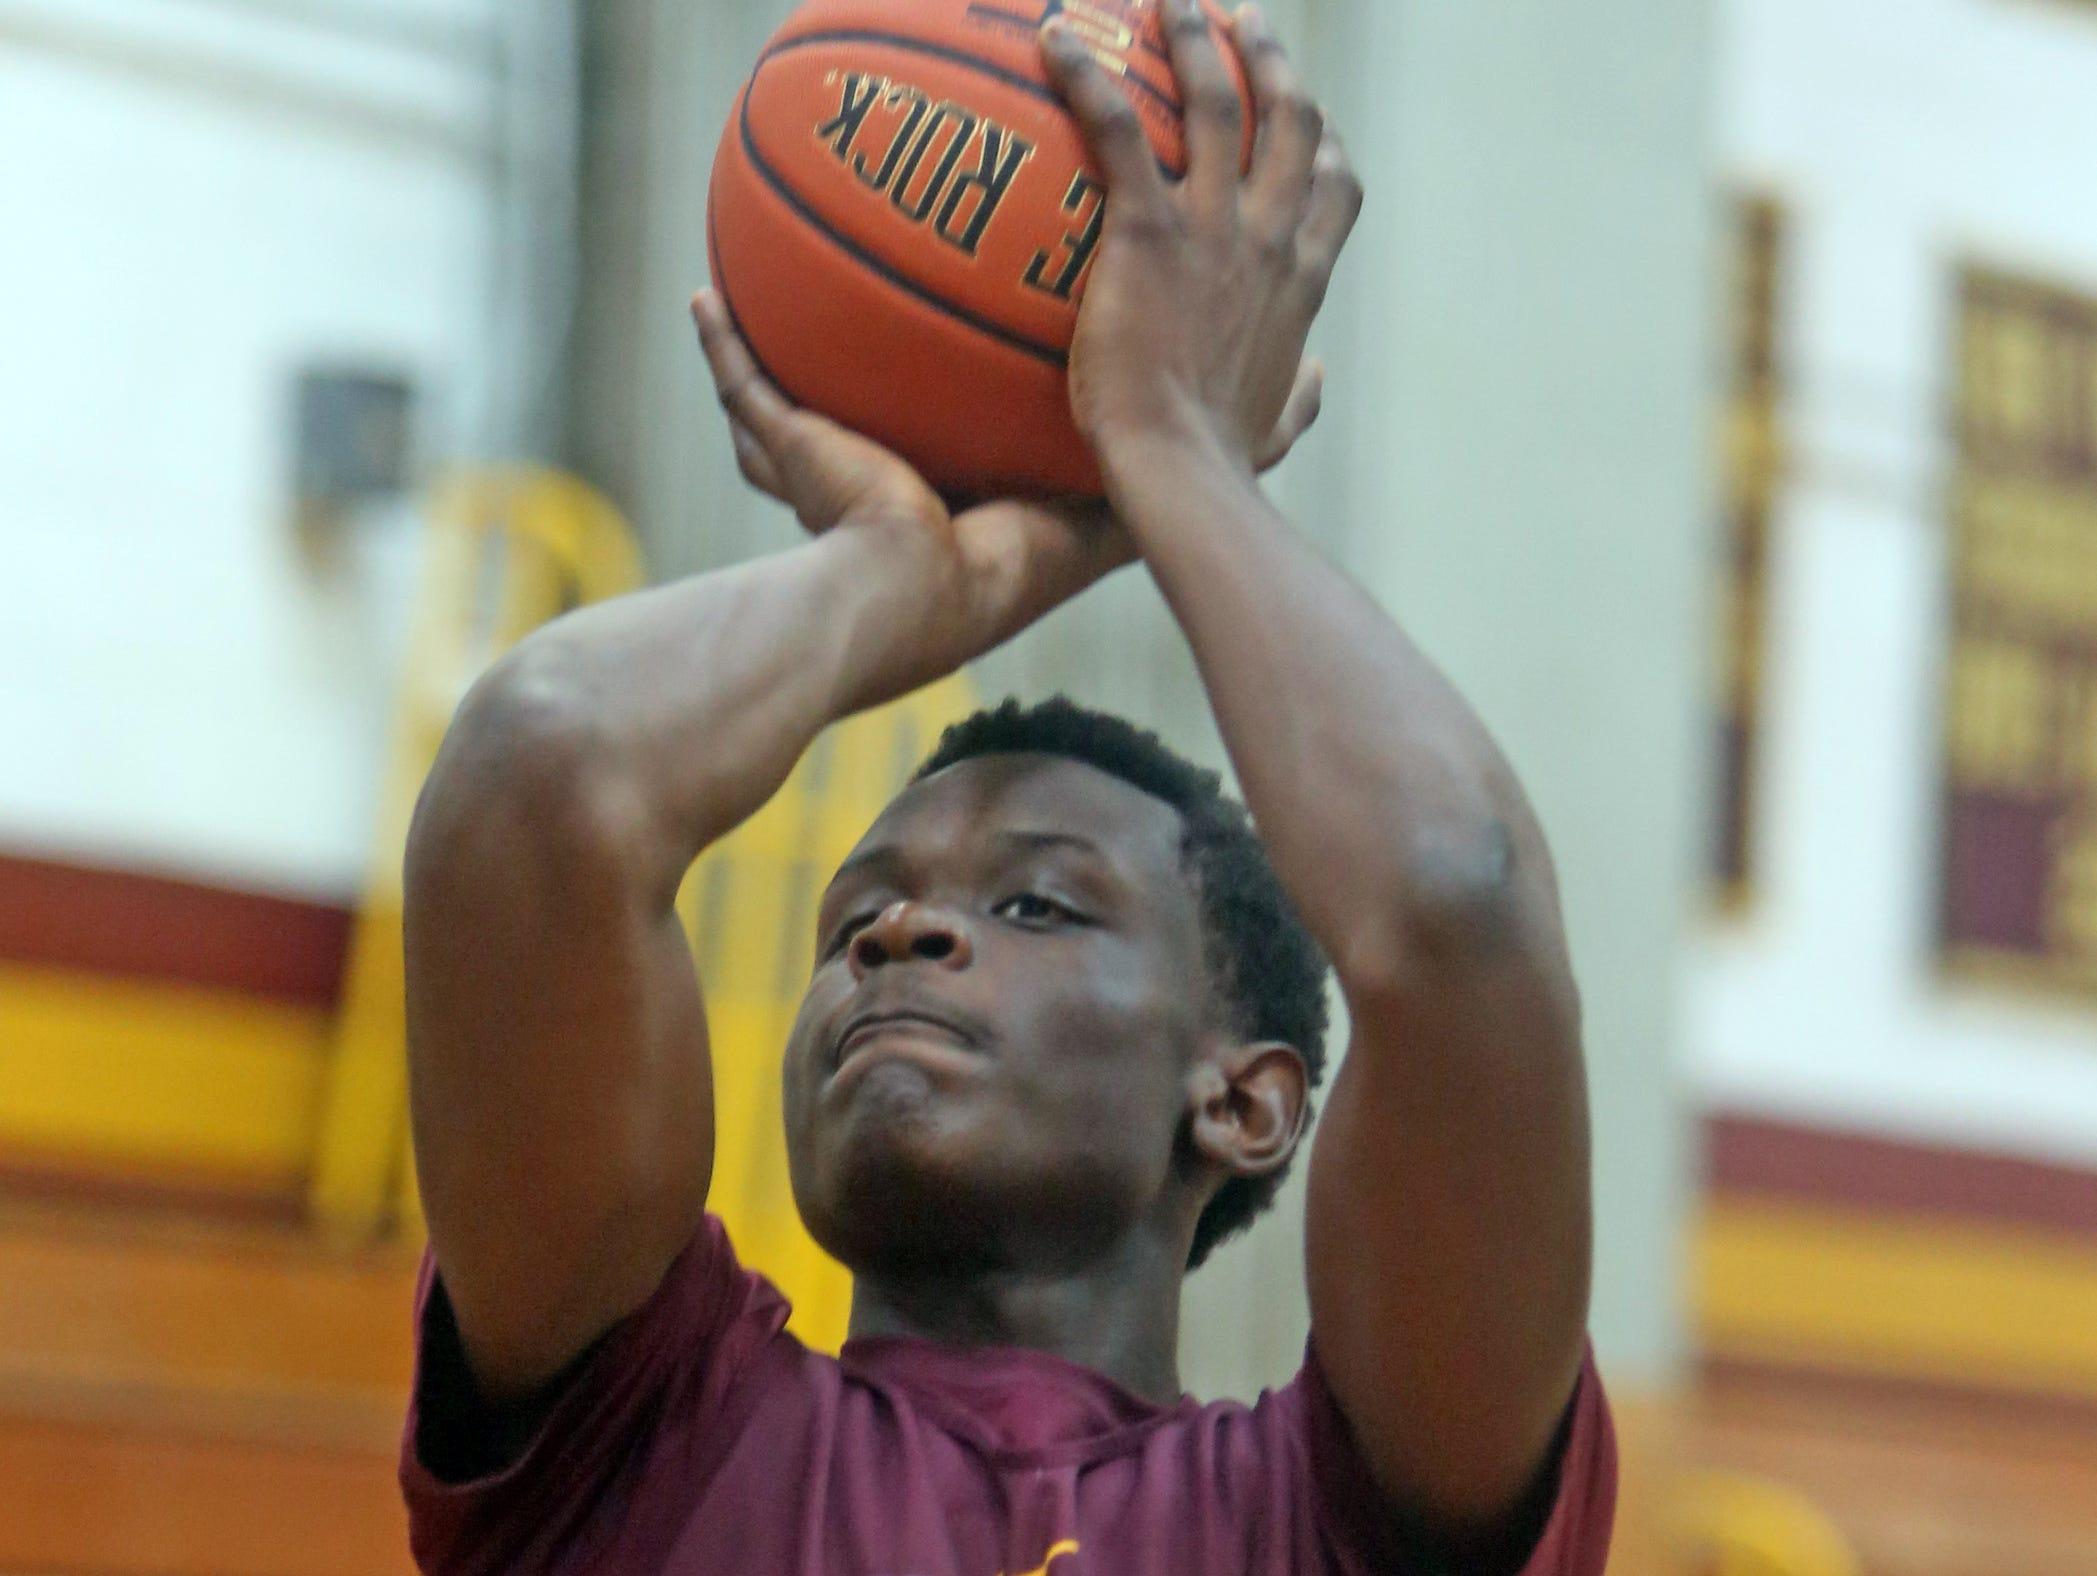 Mount Vernon High School basketball player Greg Calixte shoots during practice Nov. 25, 2015.